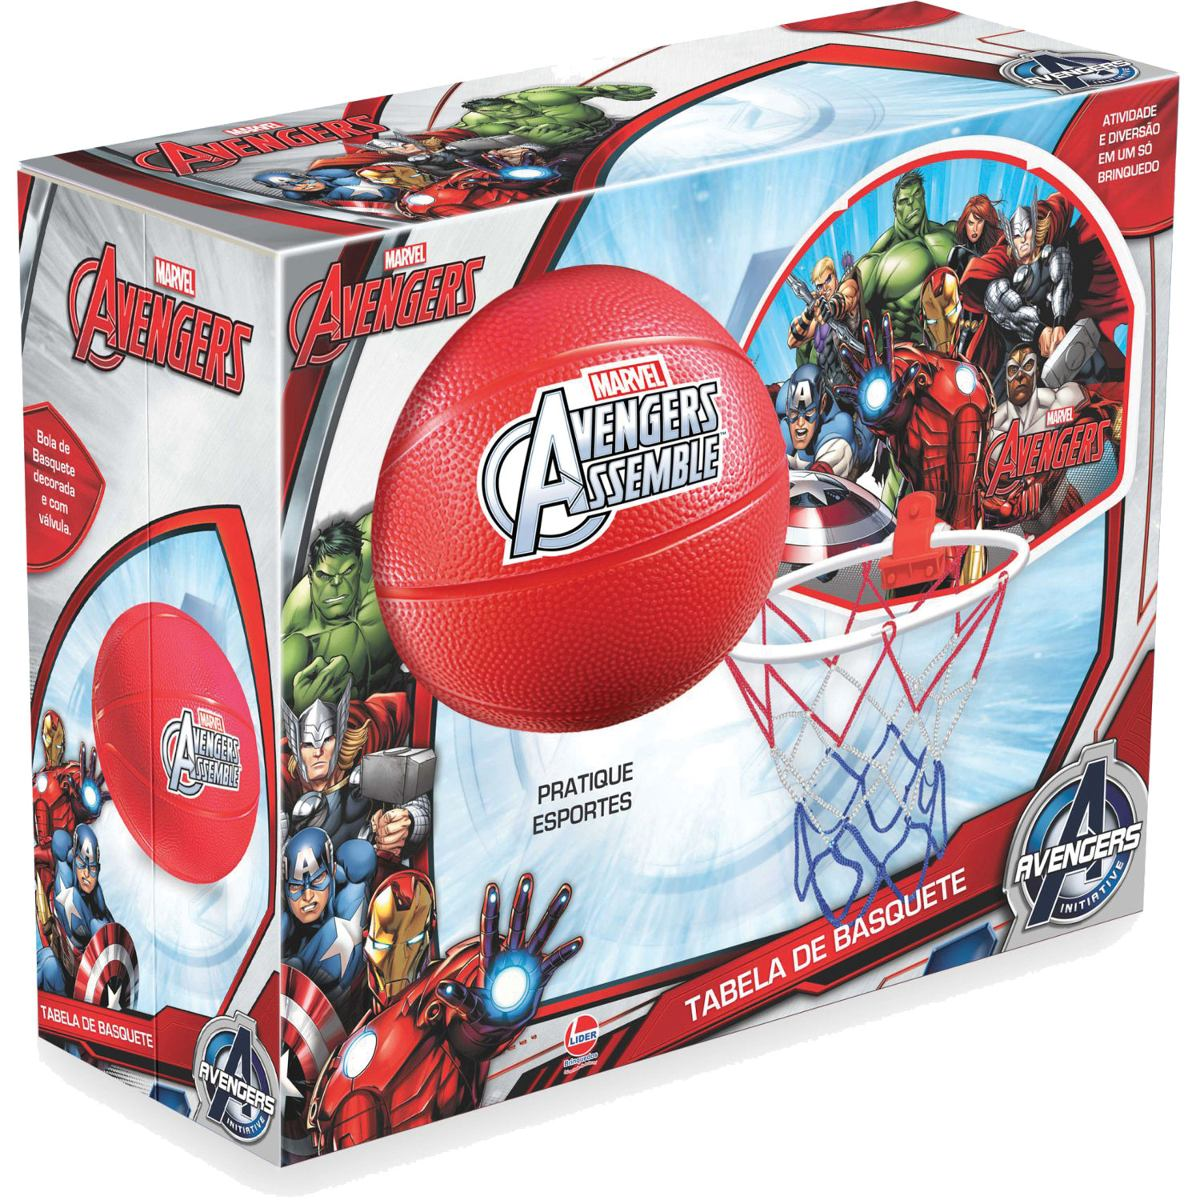 Tabela De Basquete The Avengers Tabela+bola - R  116 867c61bbe3260